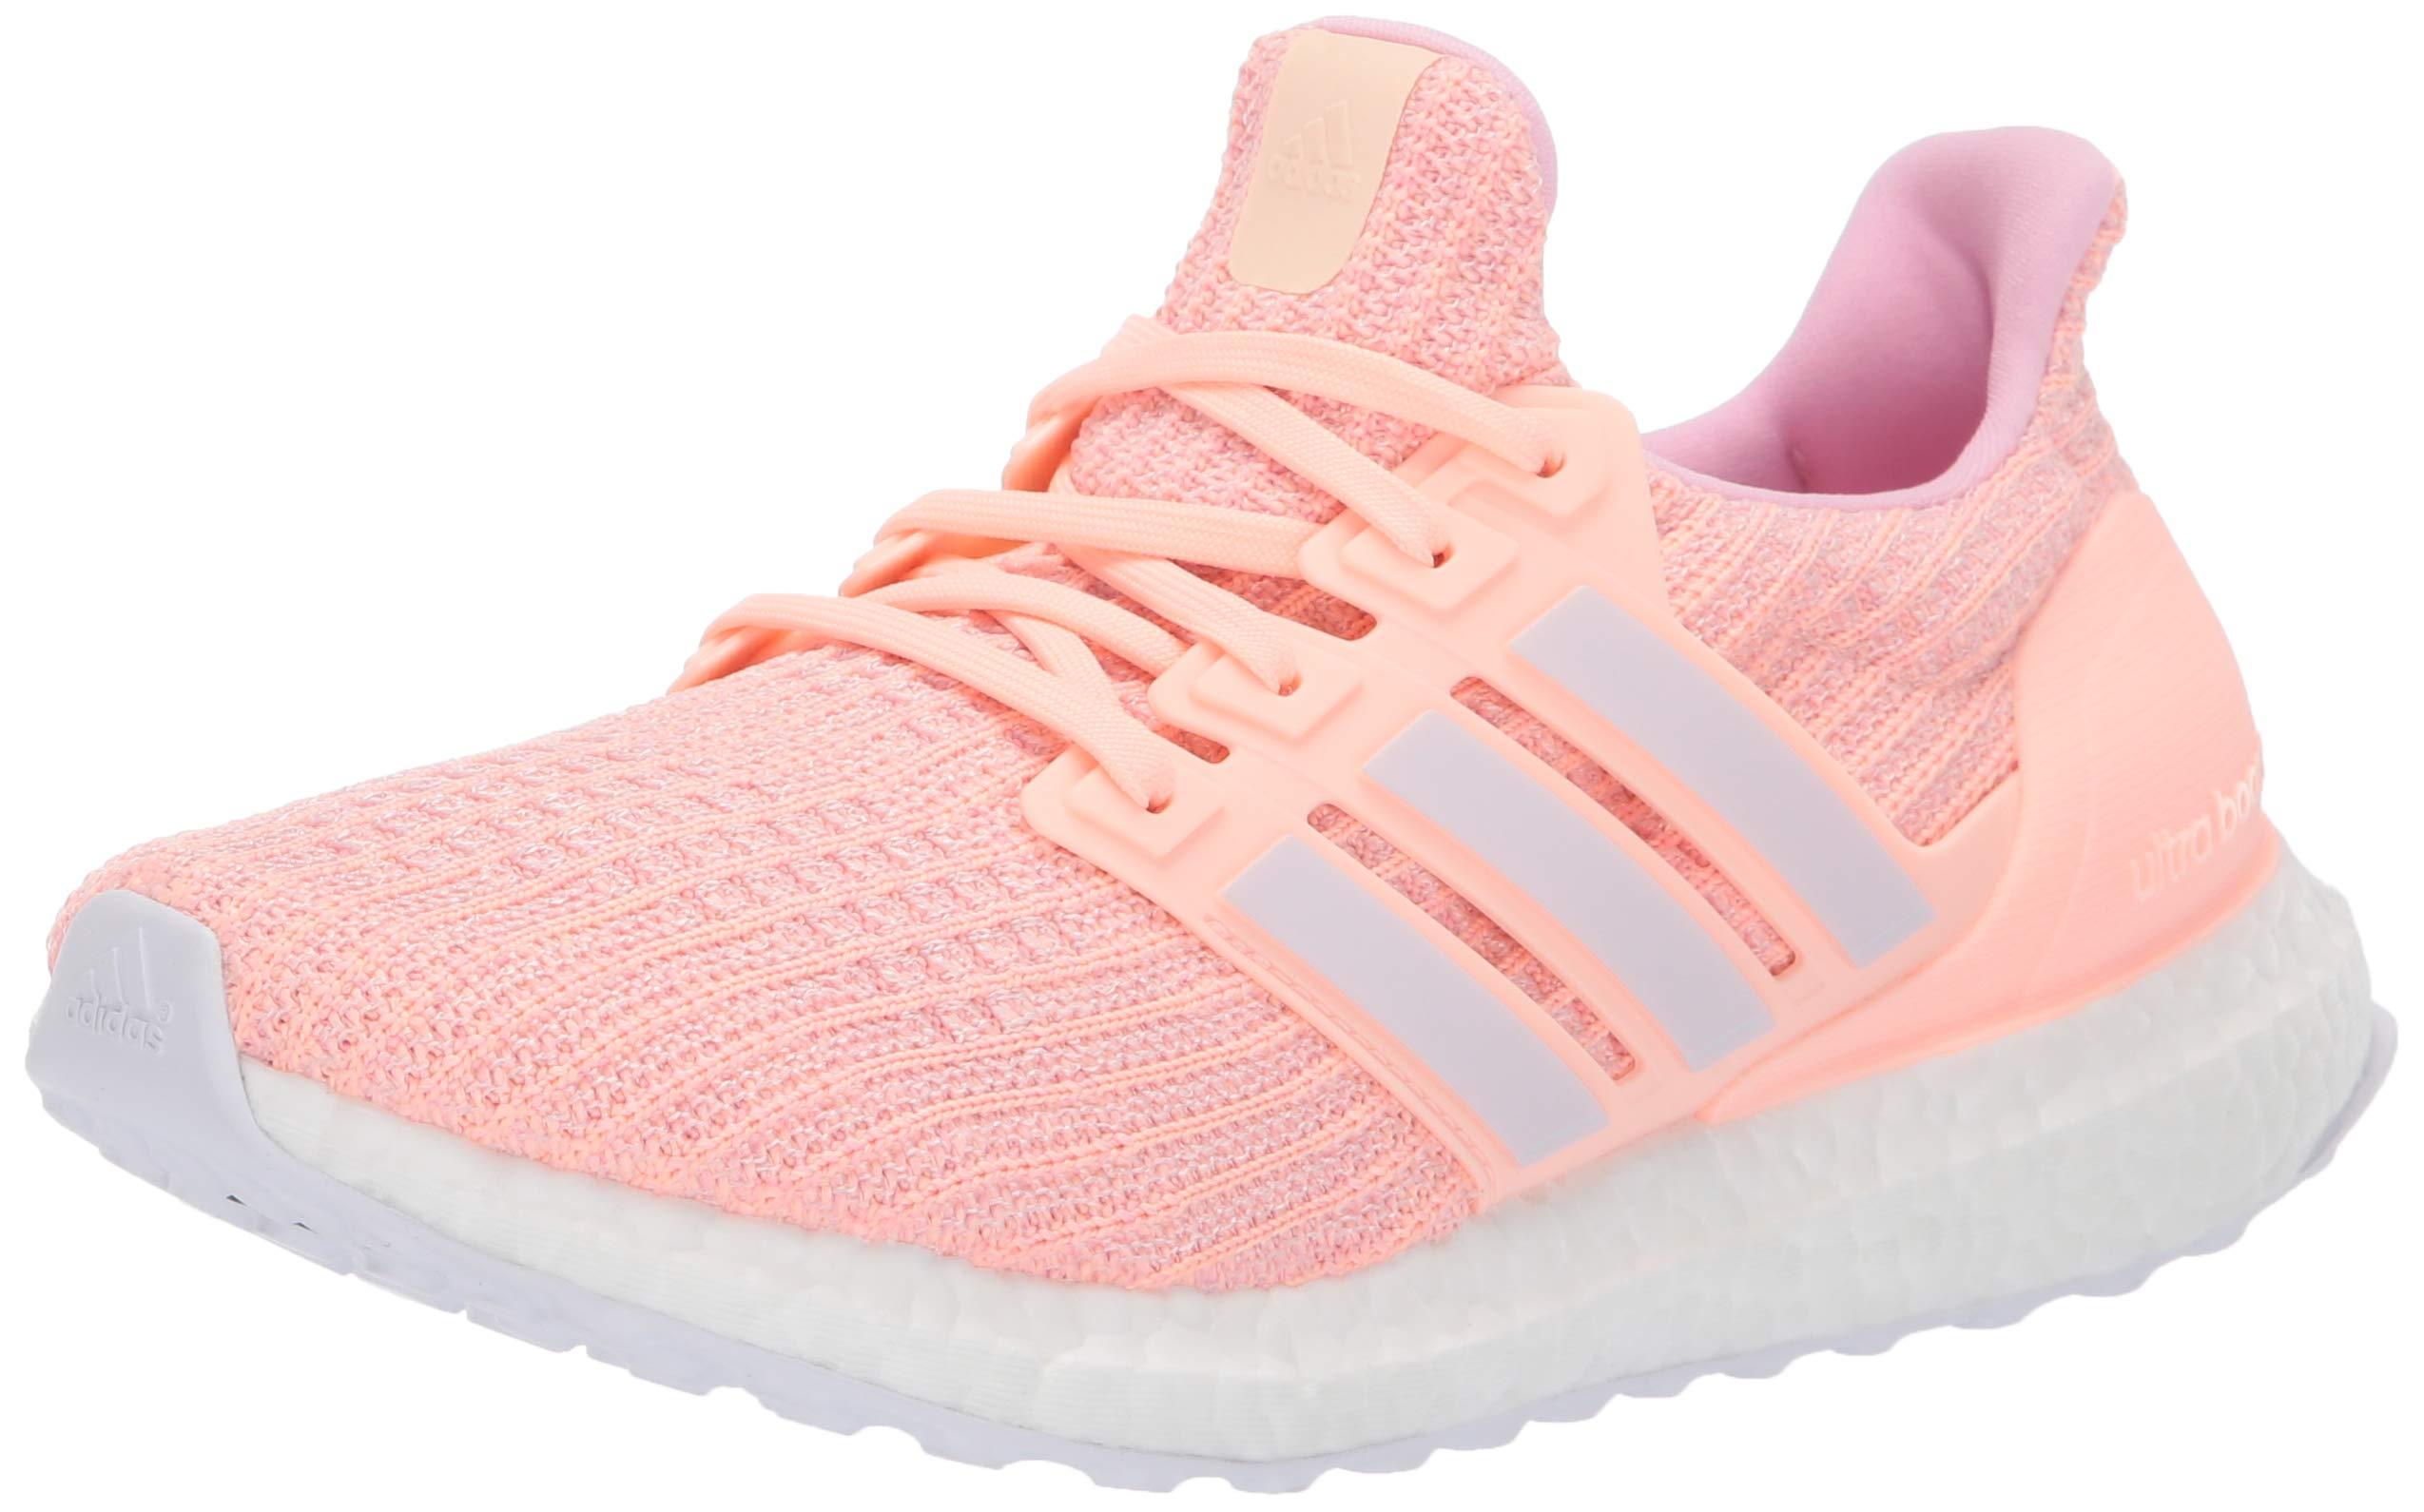 adidas Women's Ultraboost, clear orange/orchid tint/true pink, 5 M US